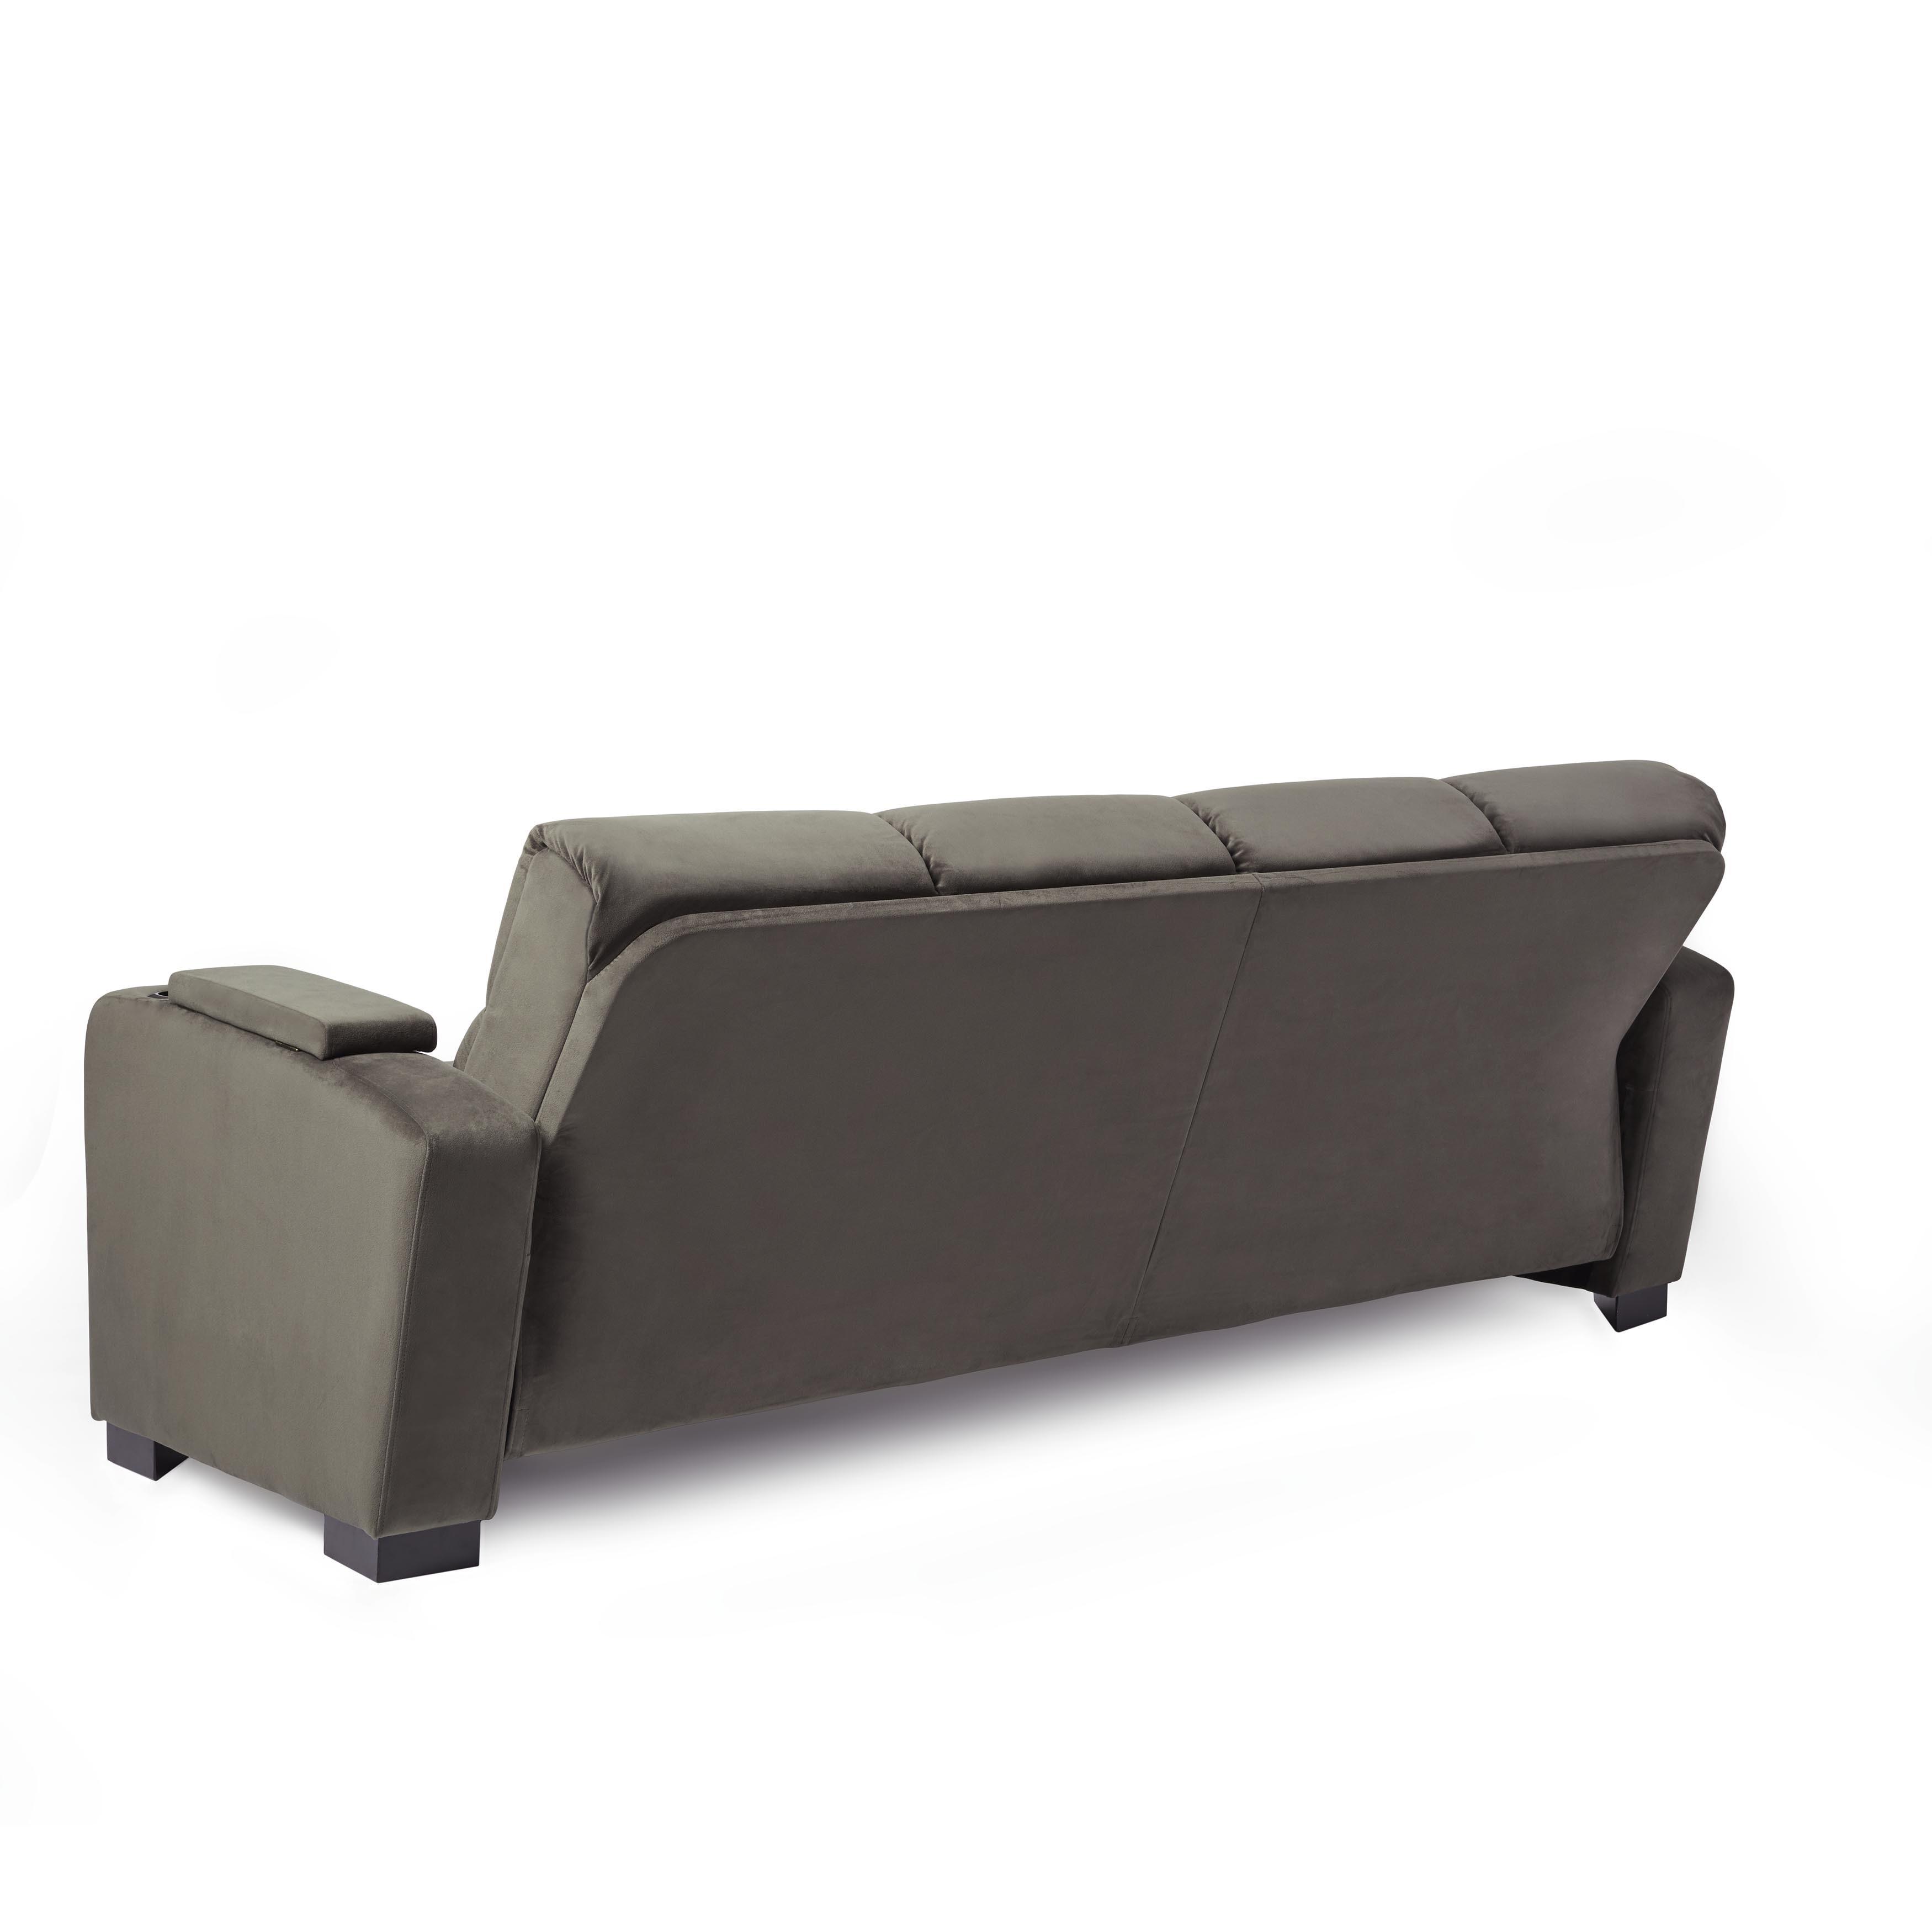 Handy Living Tevin Grey Velvet Convert a Couch Futon Sofa Sleeper